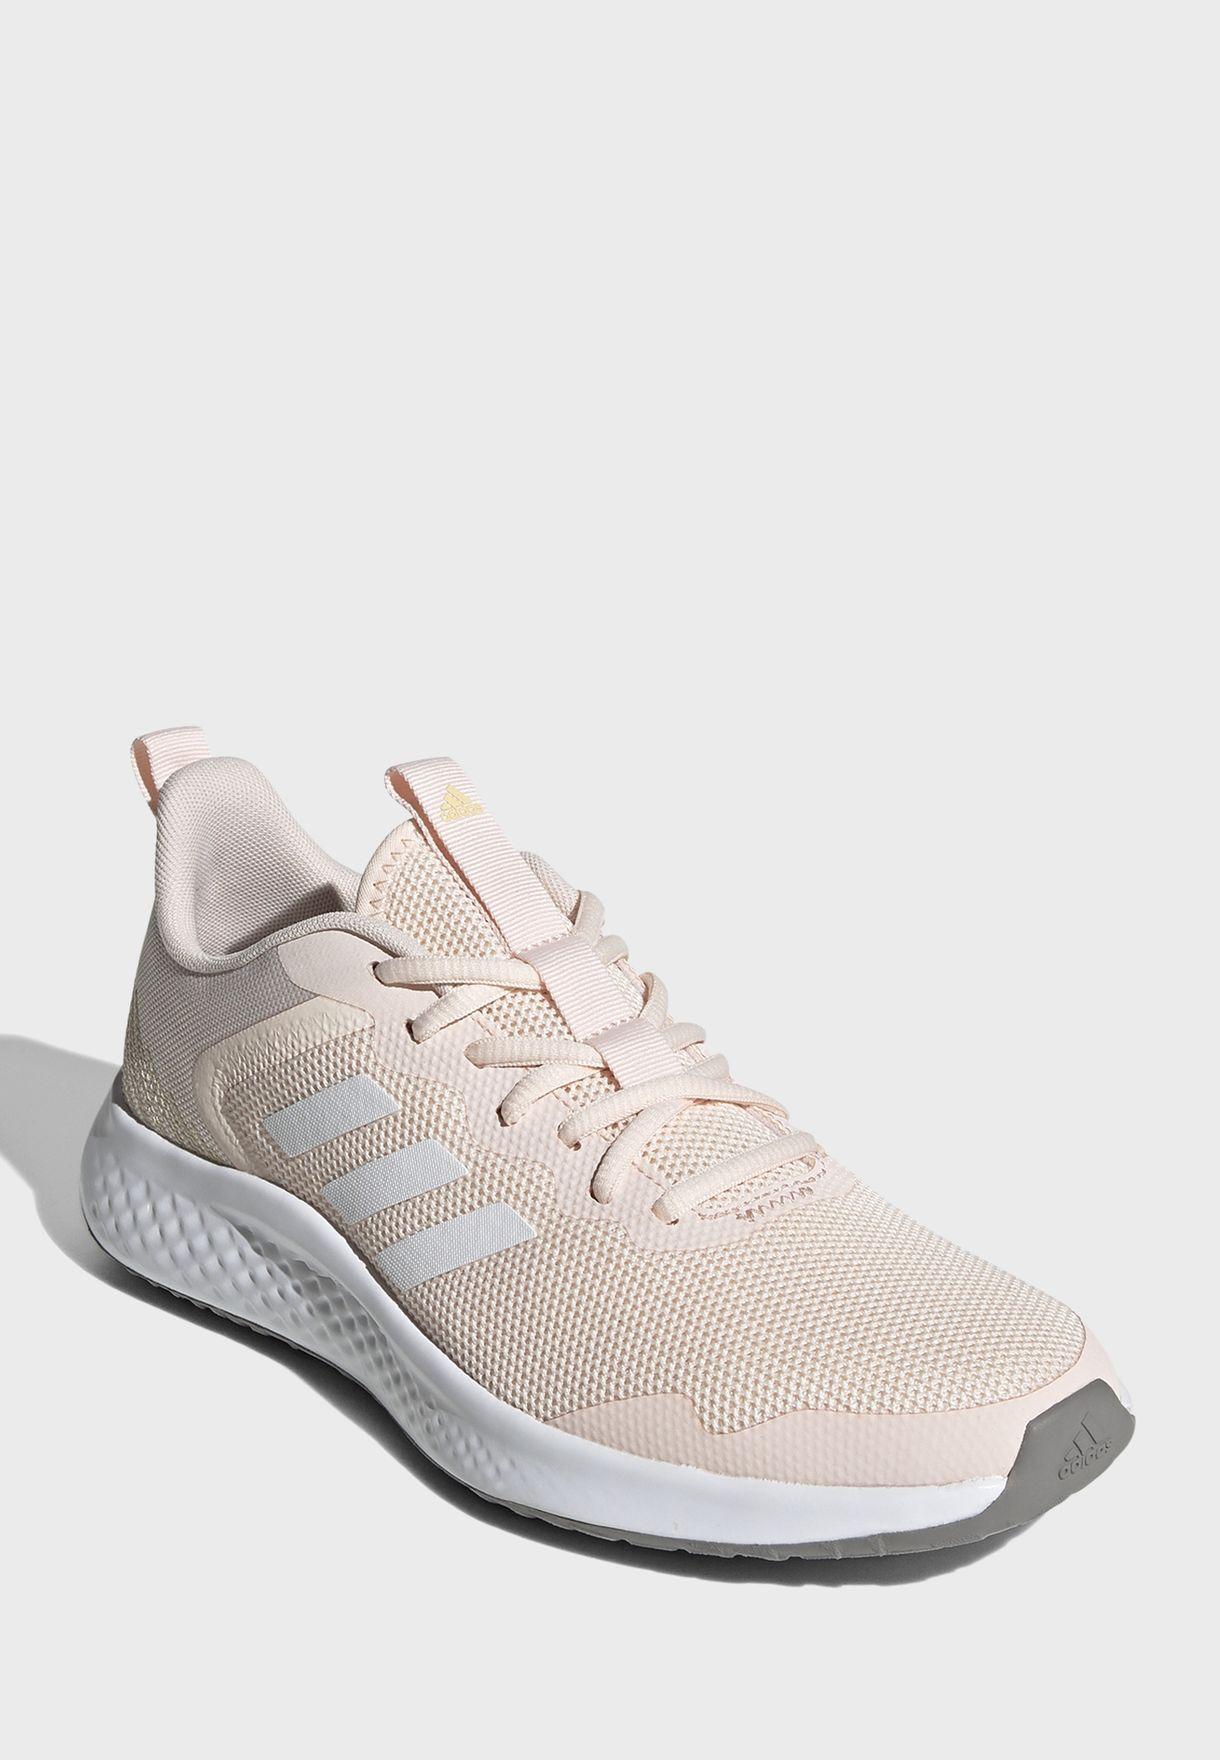 Fluidstreet Contemporary Sports Shoes